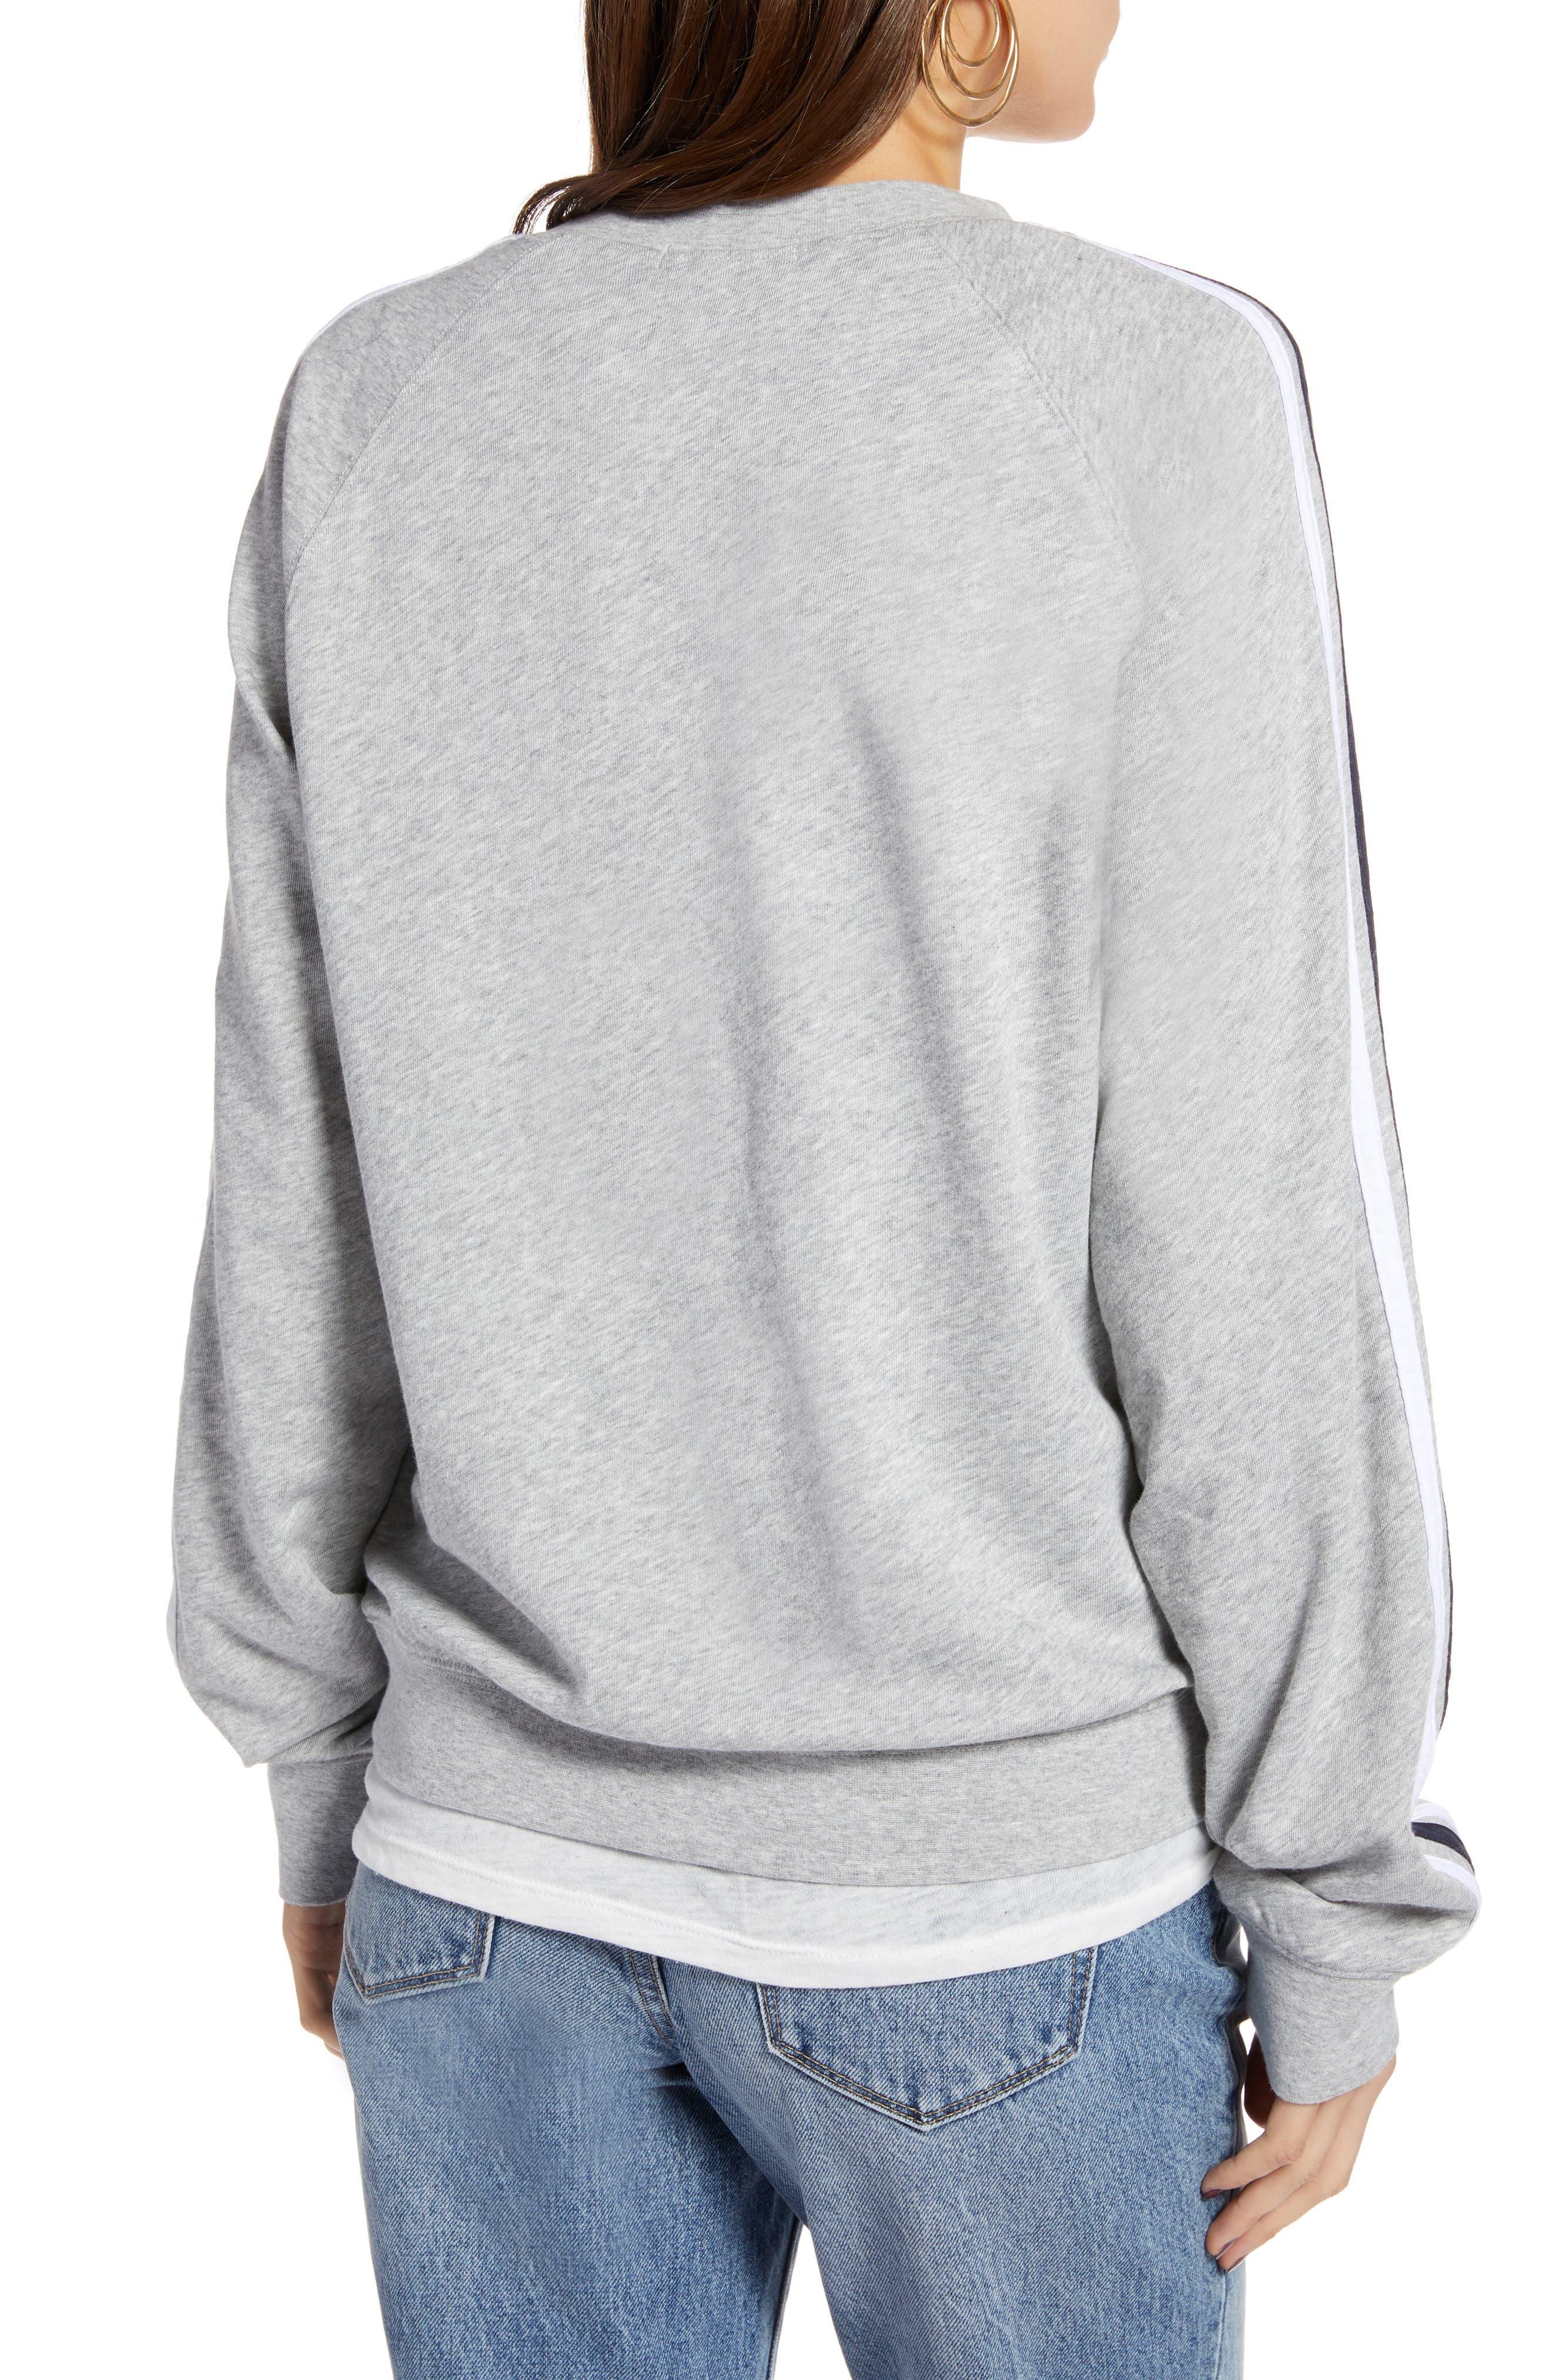 Stripe Raglan Sleeve Sweatshirt,                             Alternate thumbnail 2, color,                             030